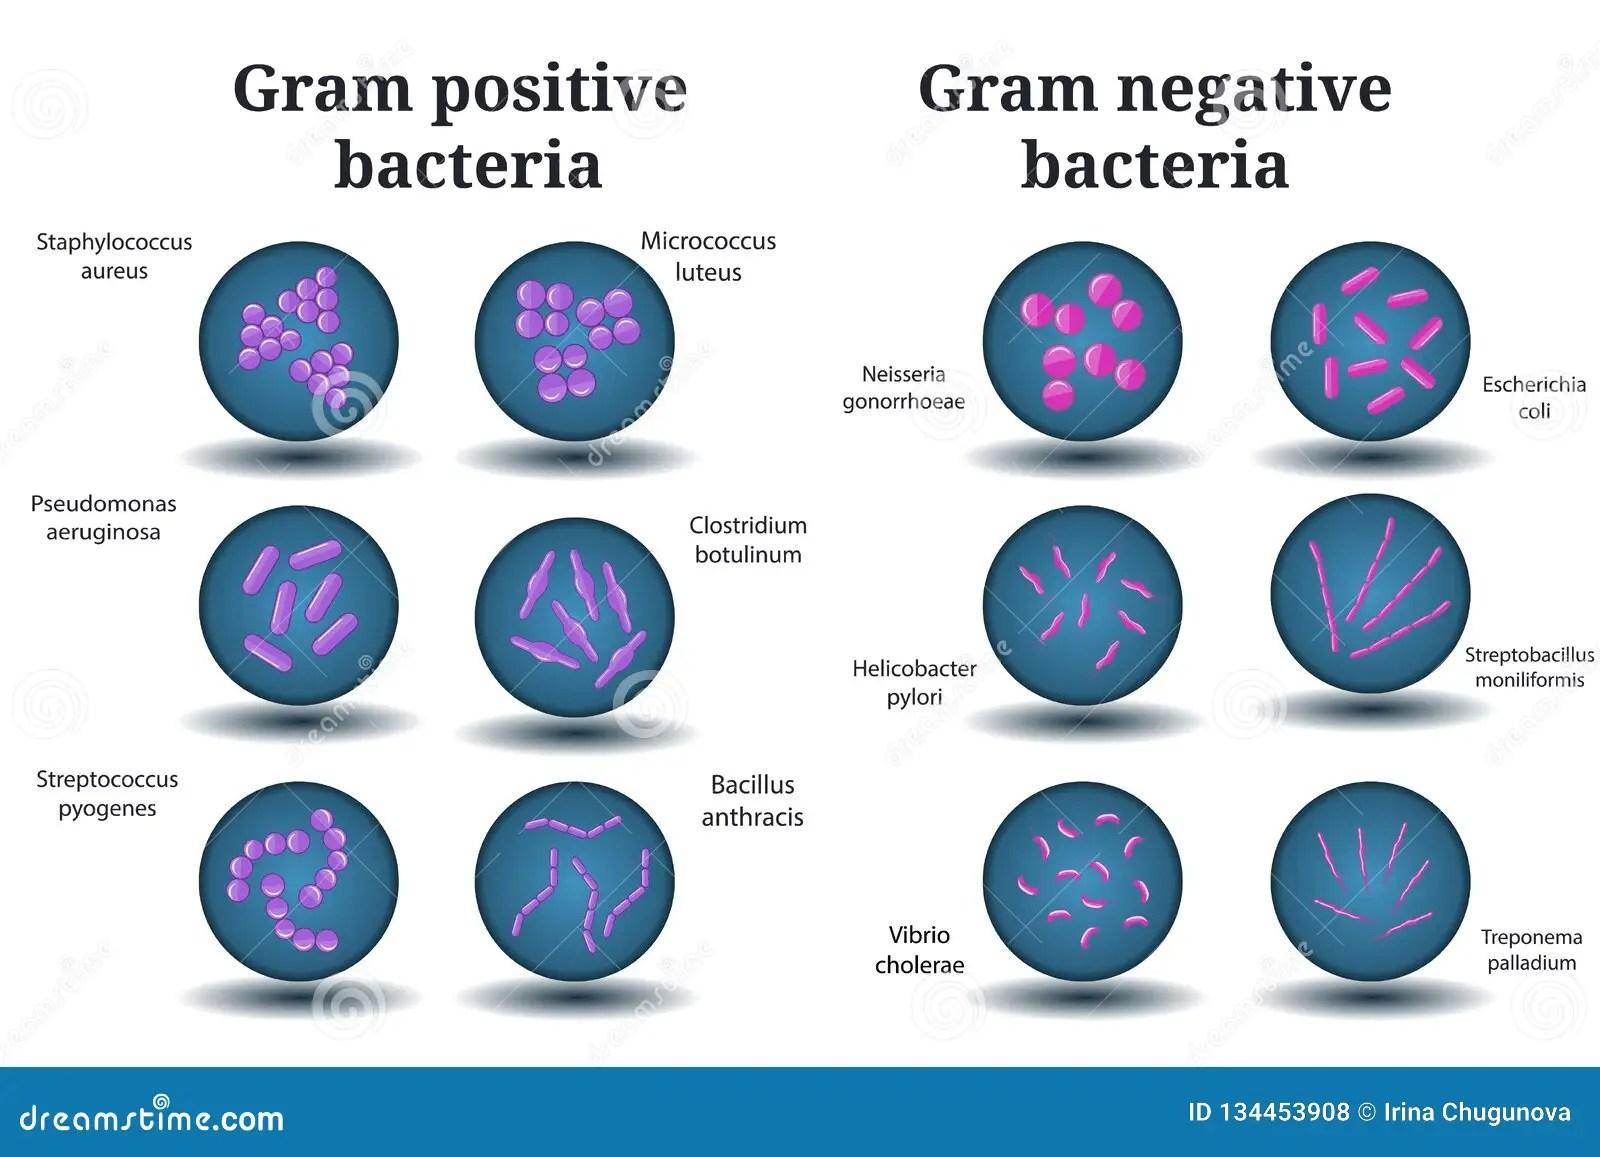 Gram Positive And Gram Negative Bacteria Coccus Bacillus